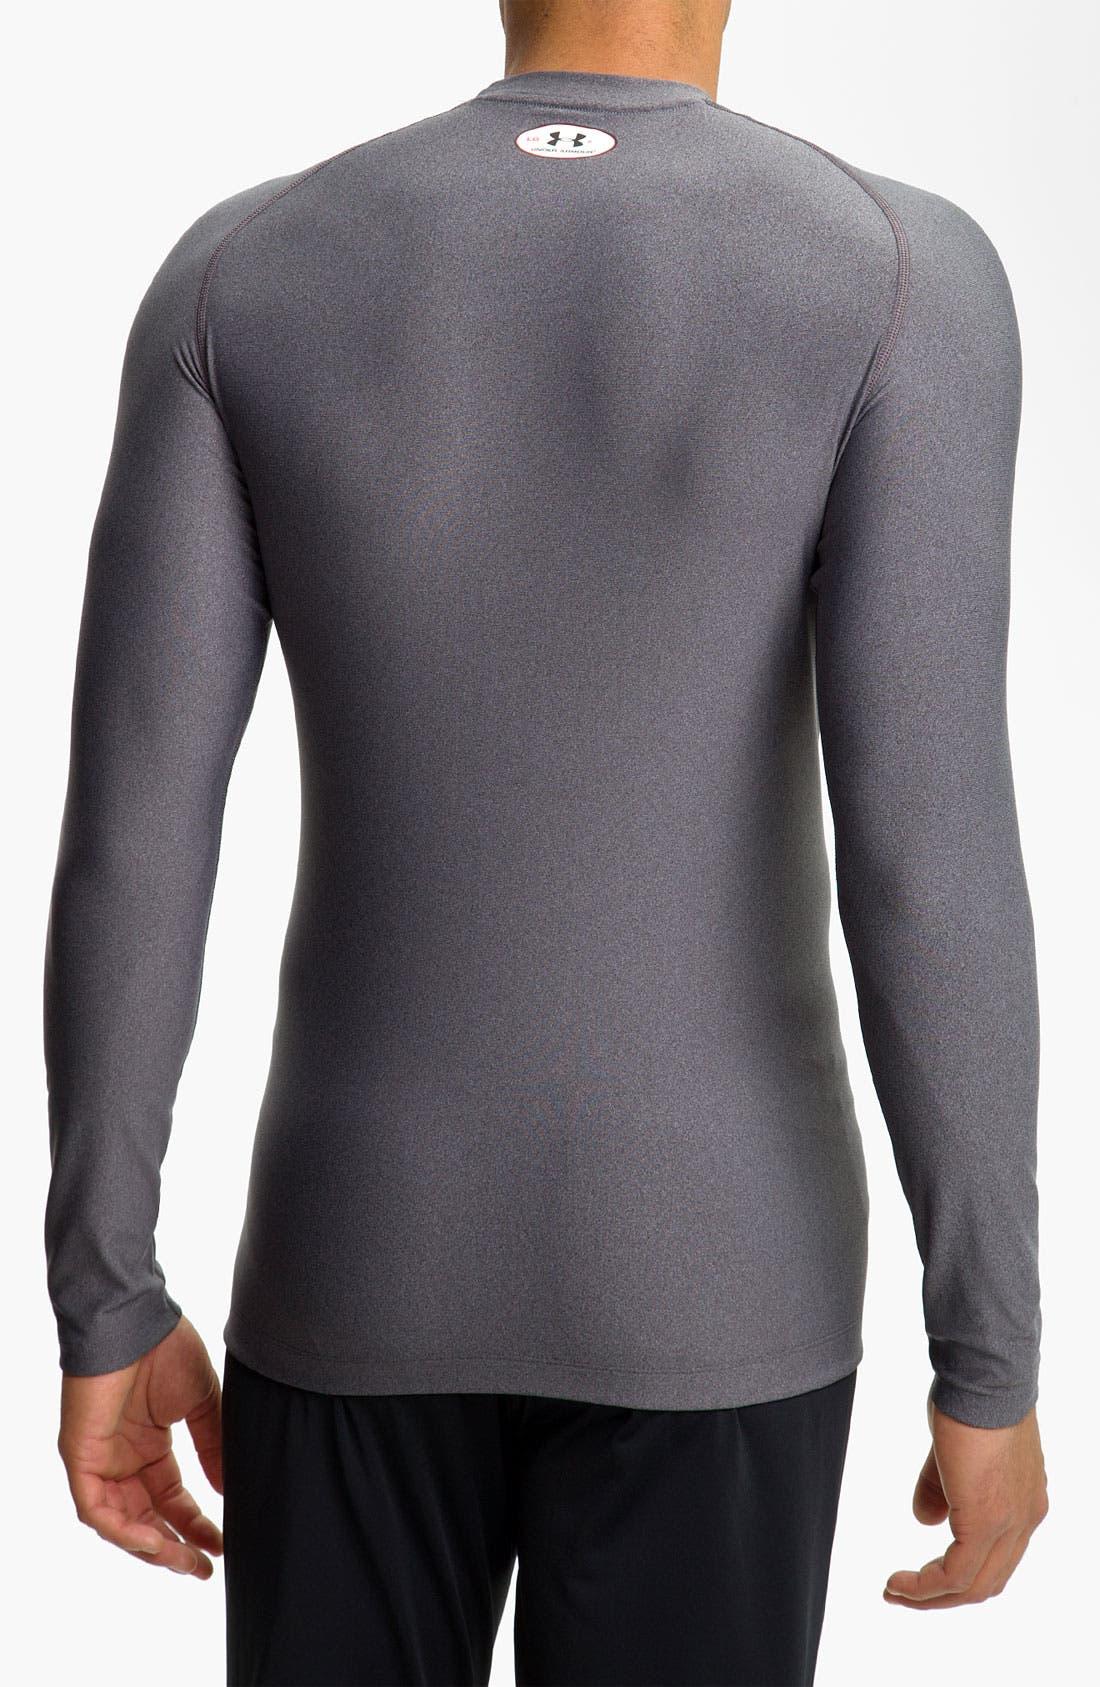 Alternate Image 2  - Under Armour 'Evo' ColdGear® Compression T-Shirt (Online Exclusive)